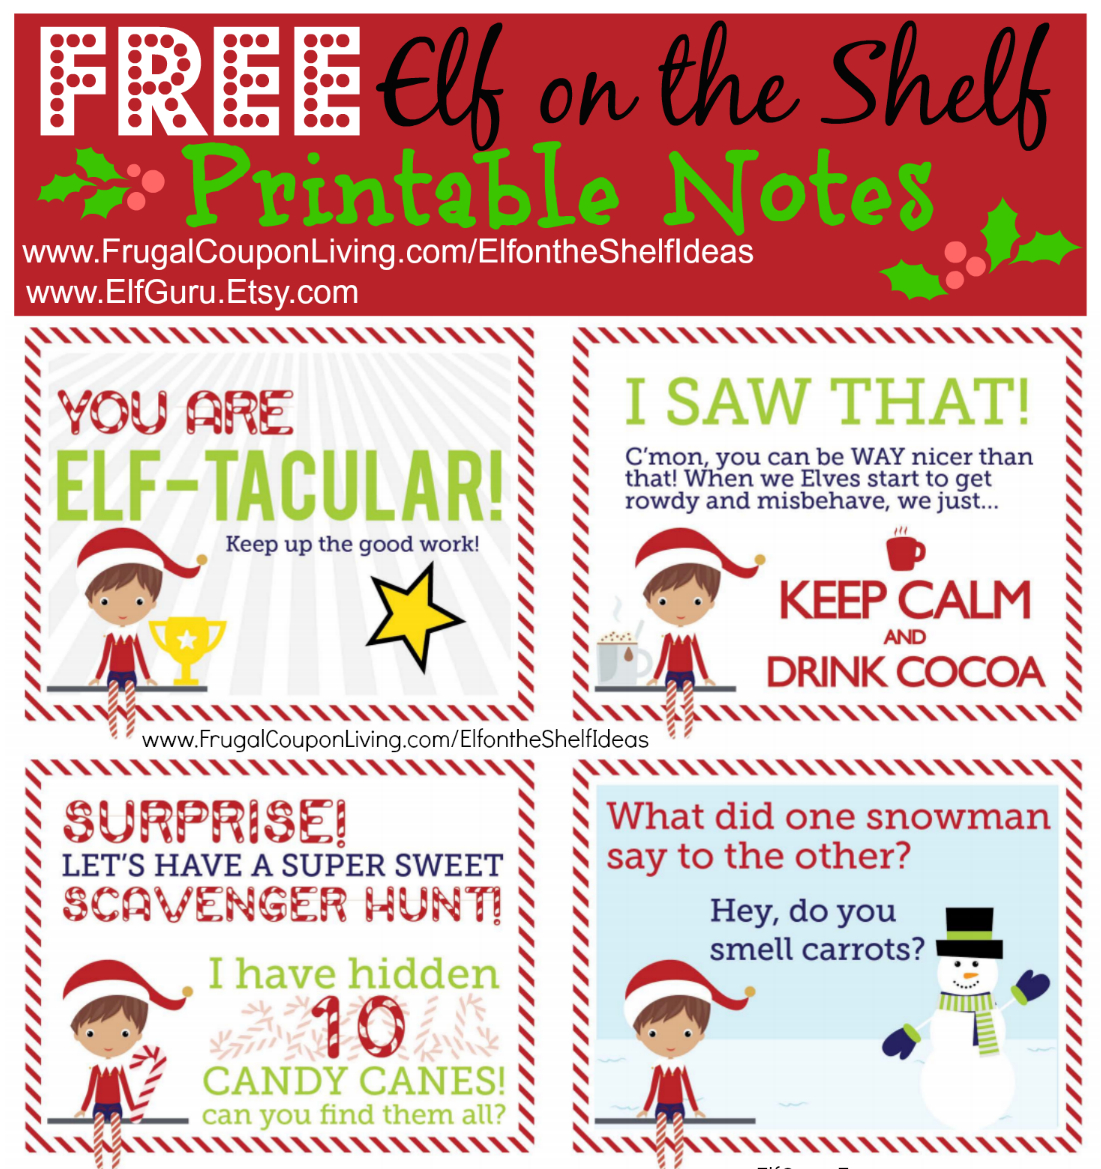 Elf On The Shelf Ideas   Free Elf Scavenger Hunt Note - Free Printable Elf On The Shelf Story